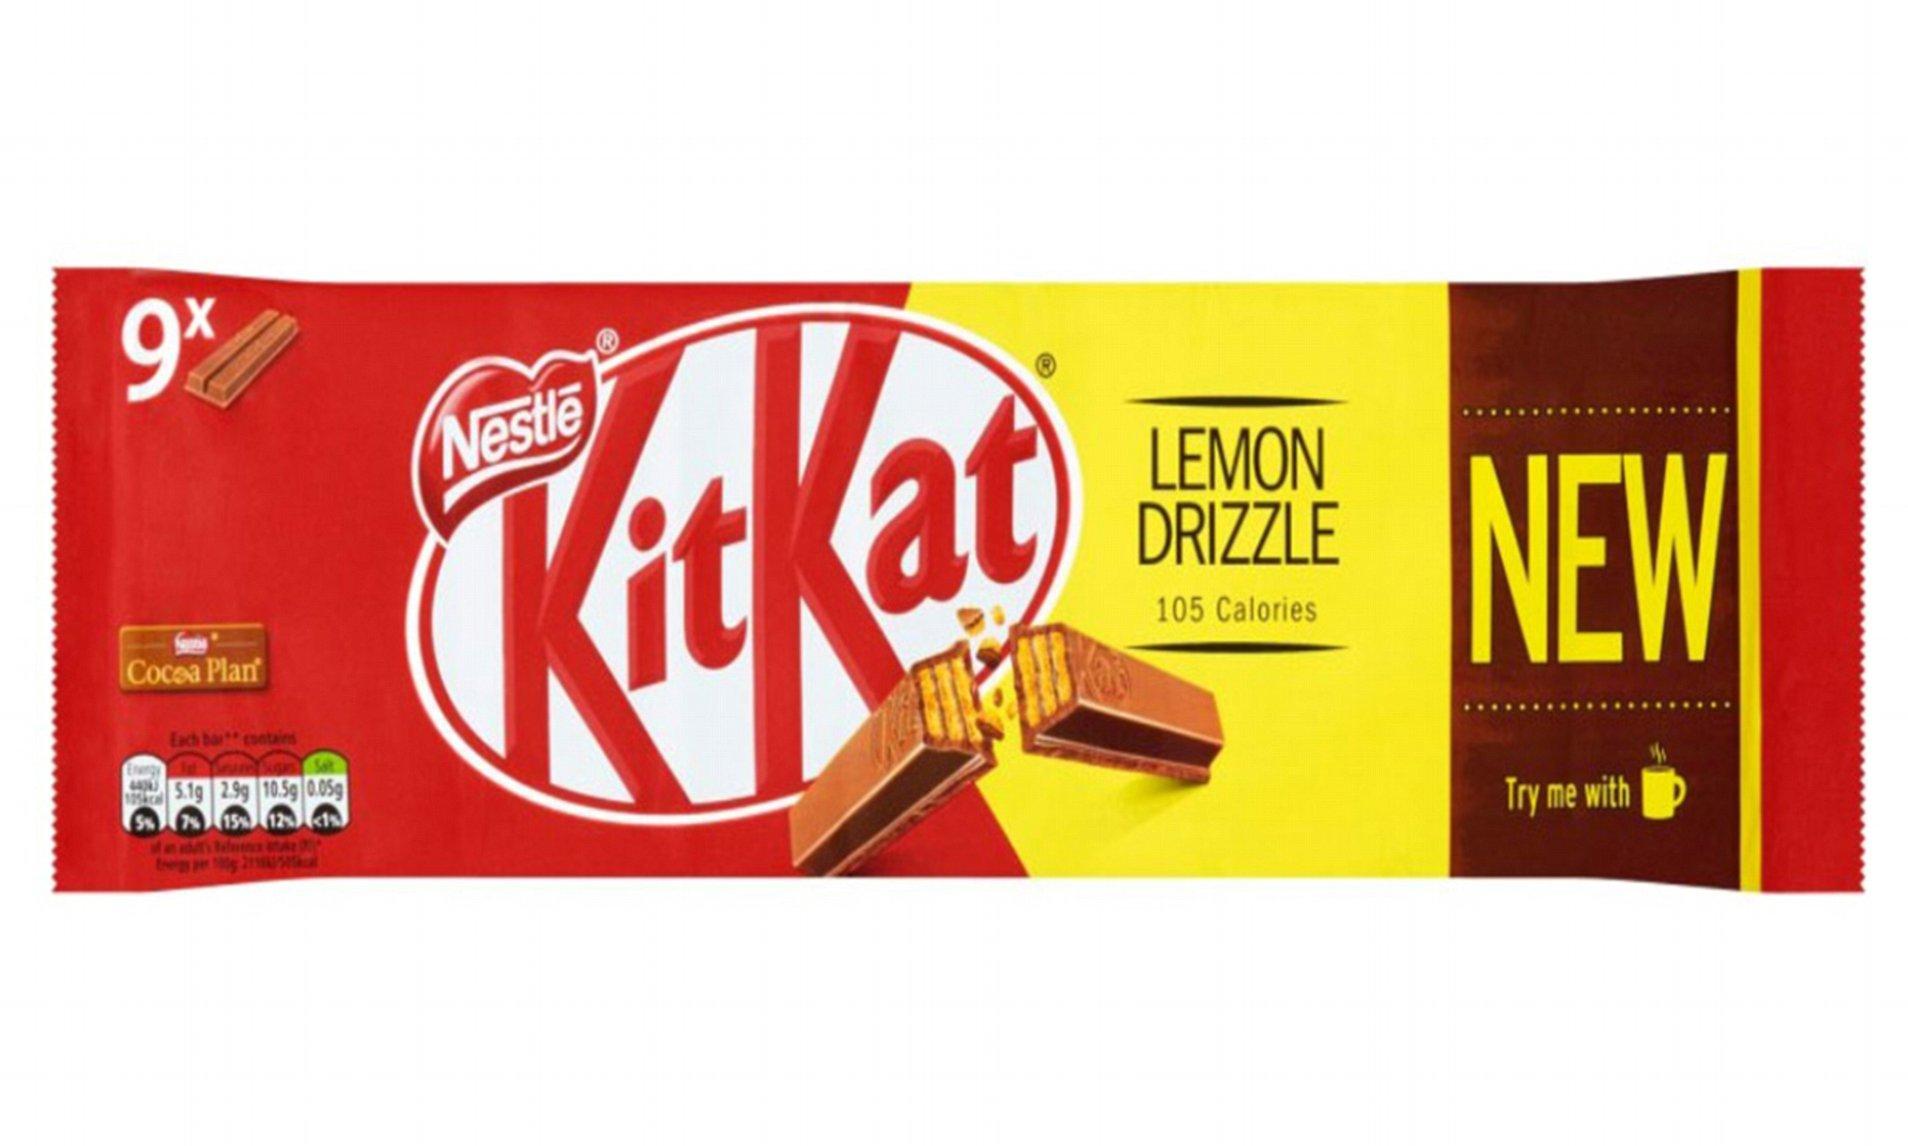 Lemon drizzle kitkat £1.50 instore @ Asda